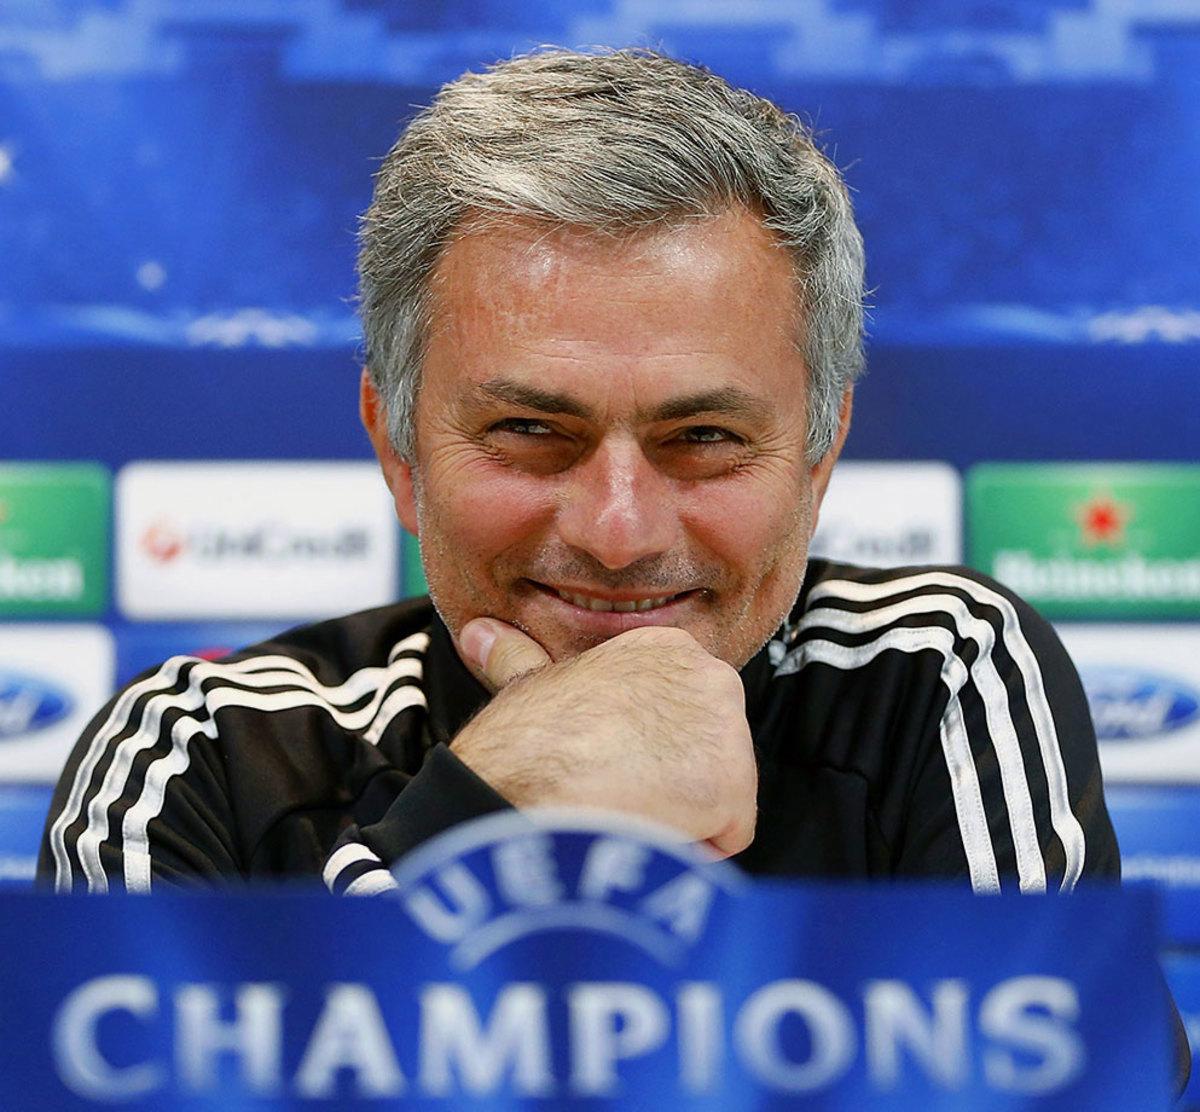 2013-0602-Jose-Mourinho-157451720.jpg